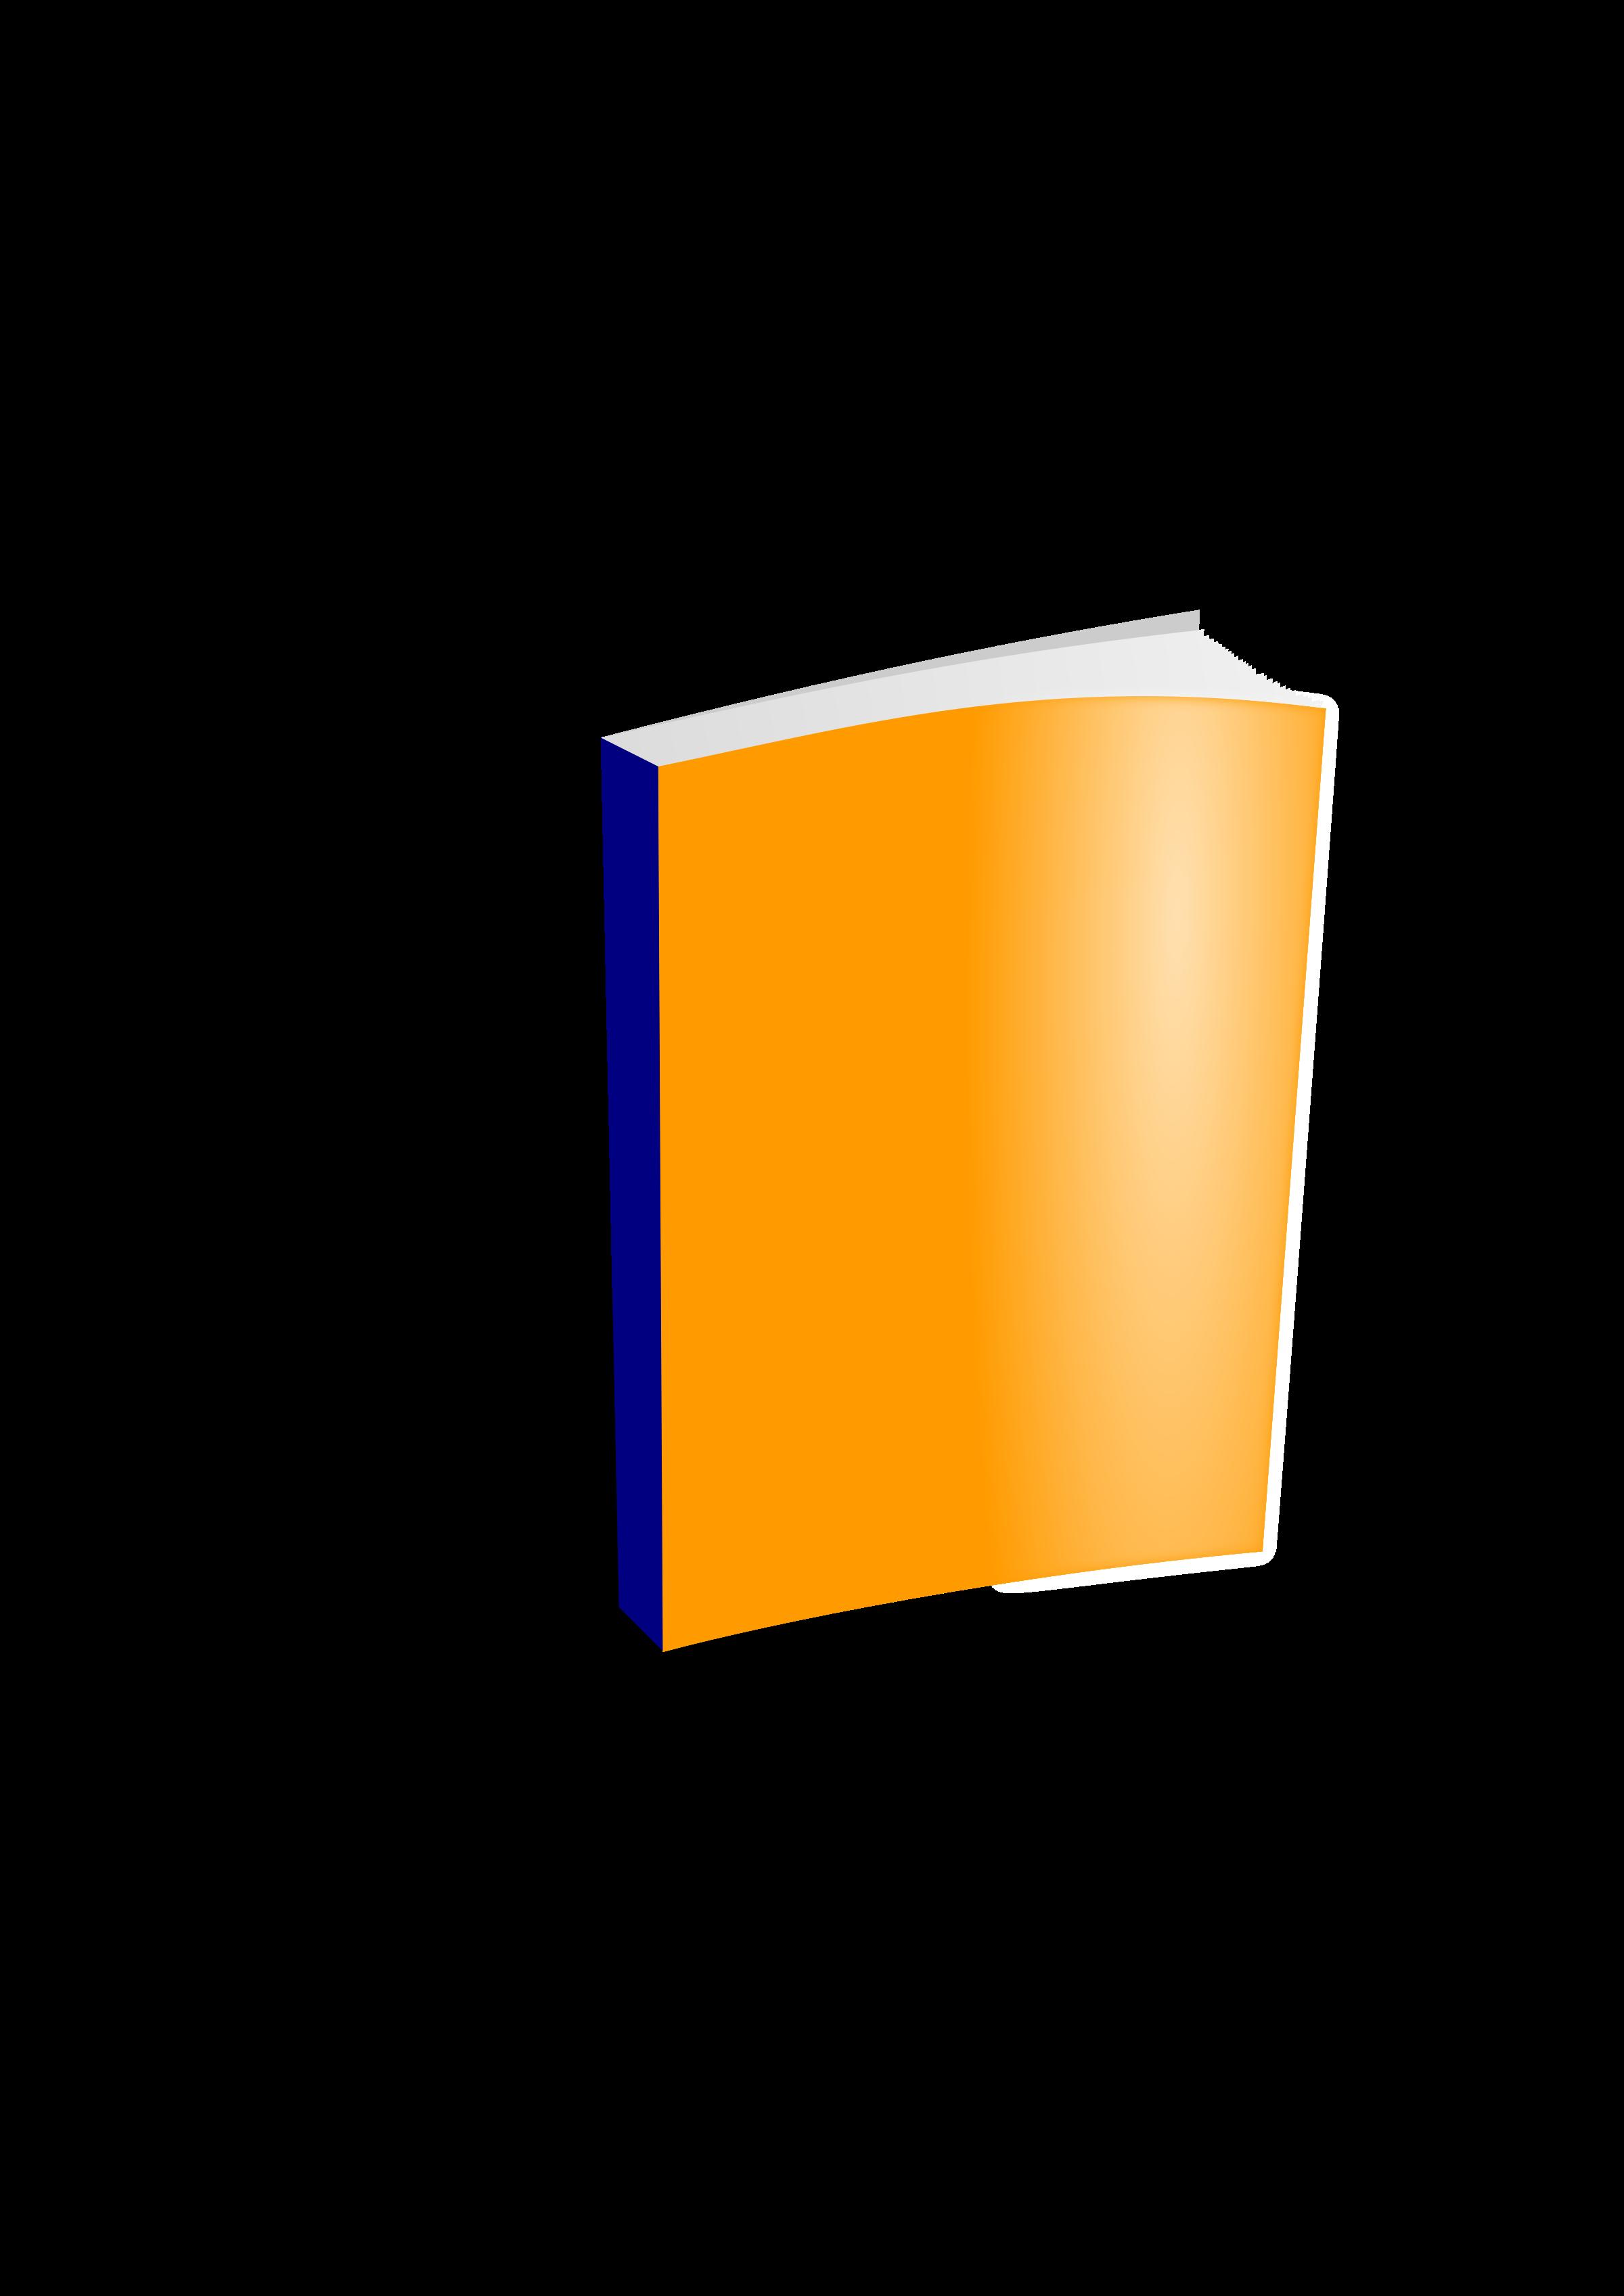 Big image png. Clipart book orange